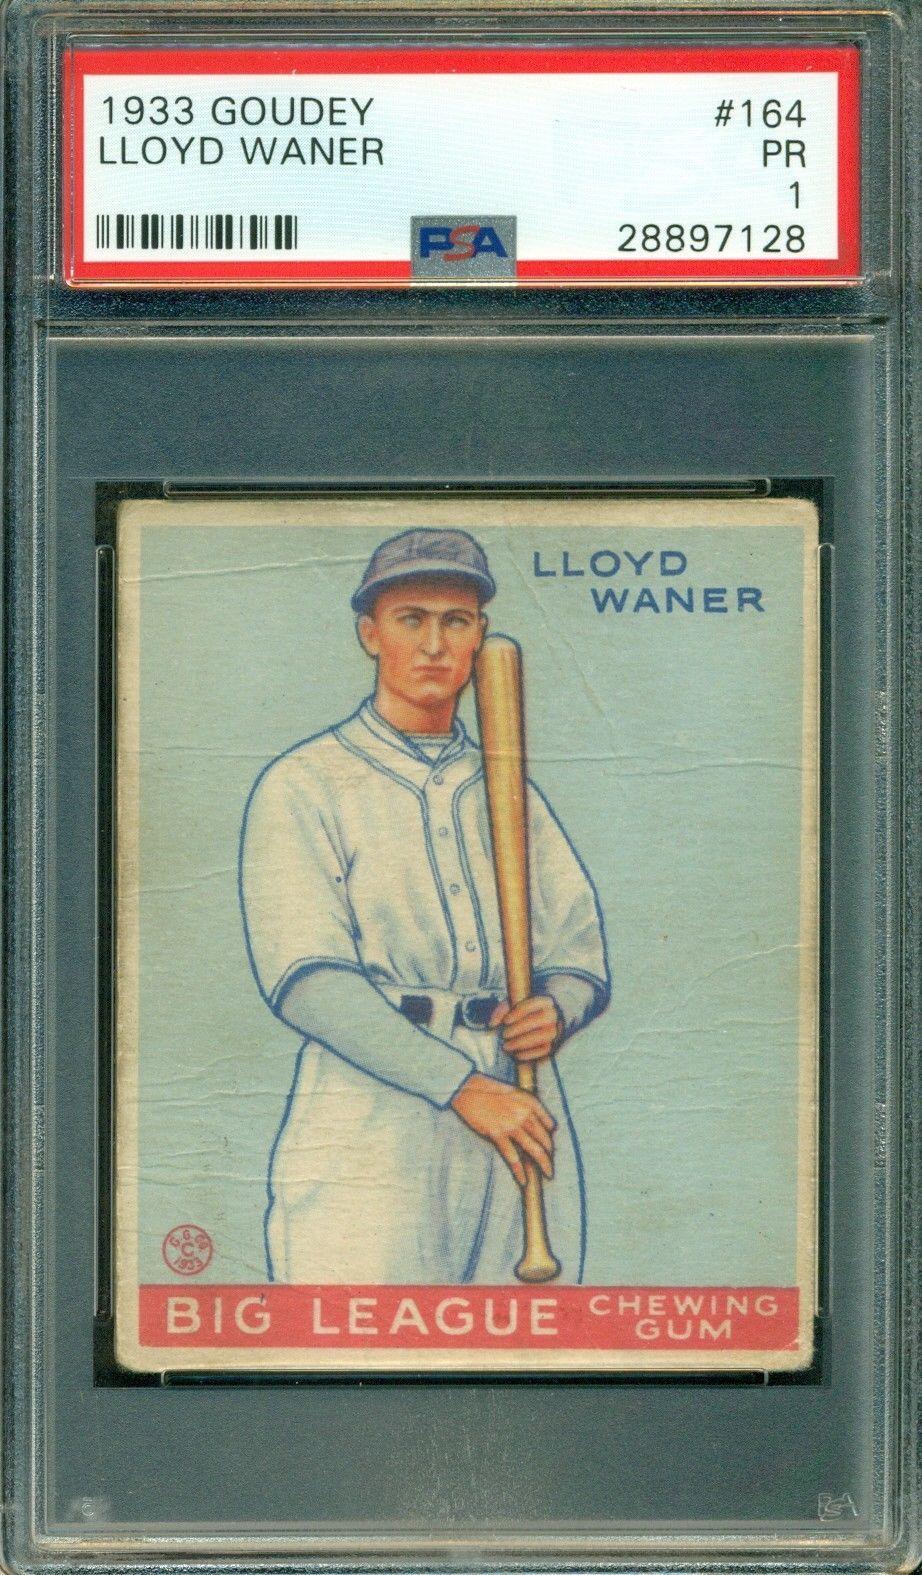 Lloyd Waner 1933 Goudey 164 Psa 1 Hall Of Fame New